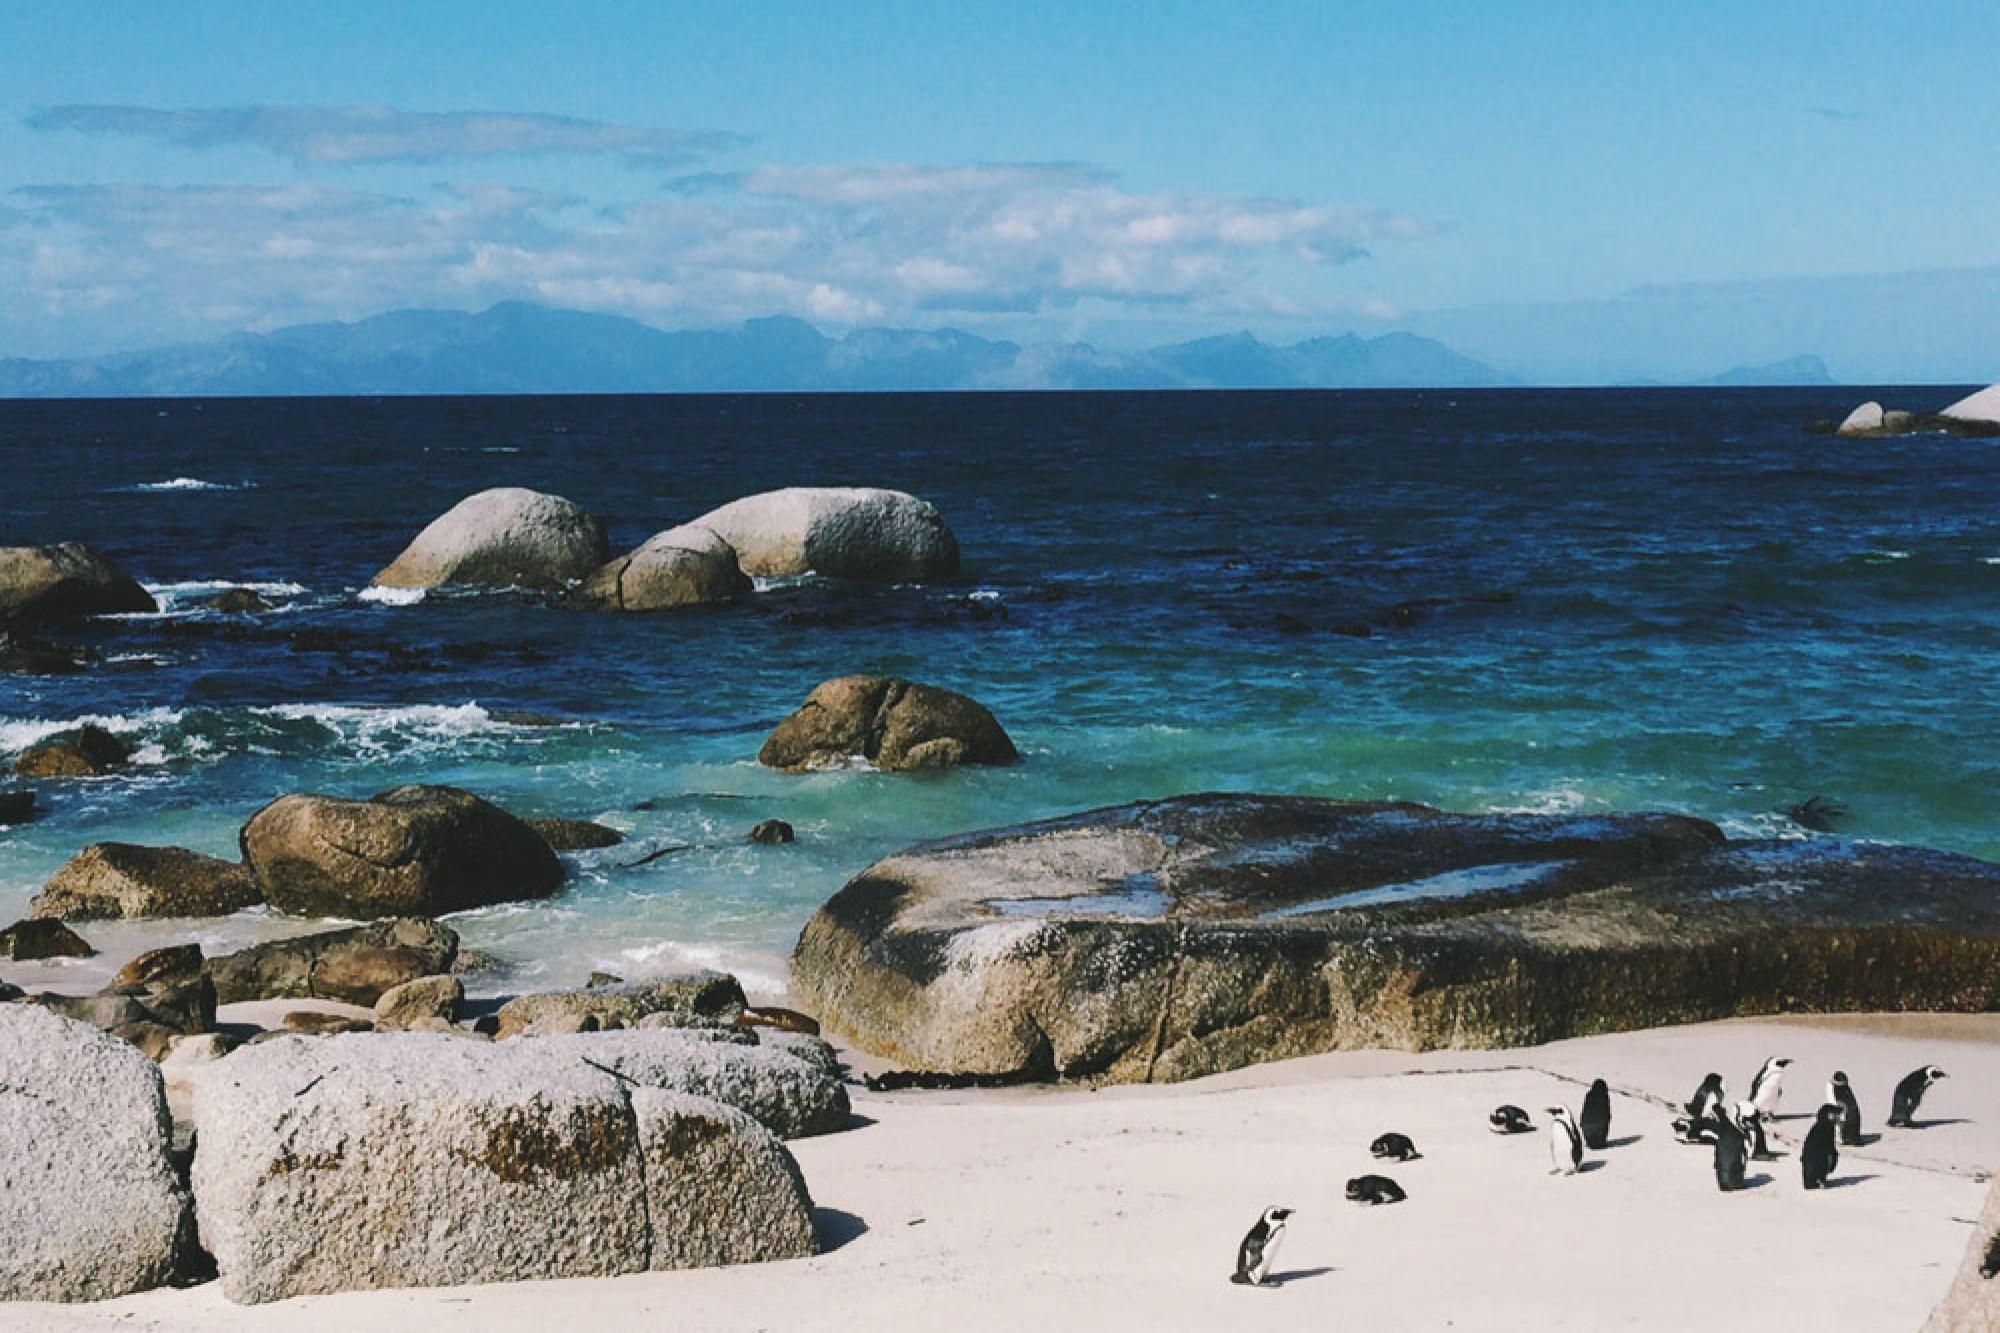 South Africa Honeymoon tips